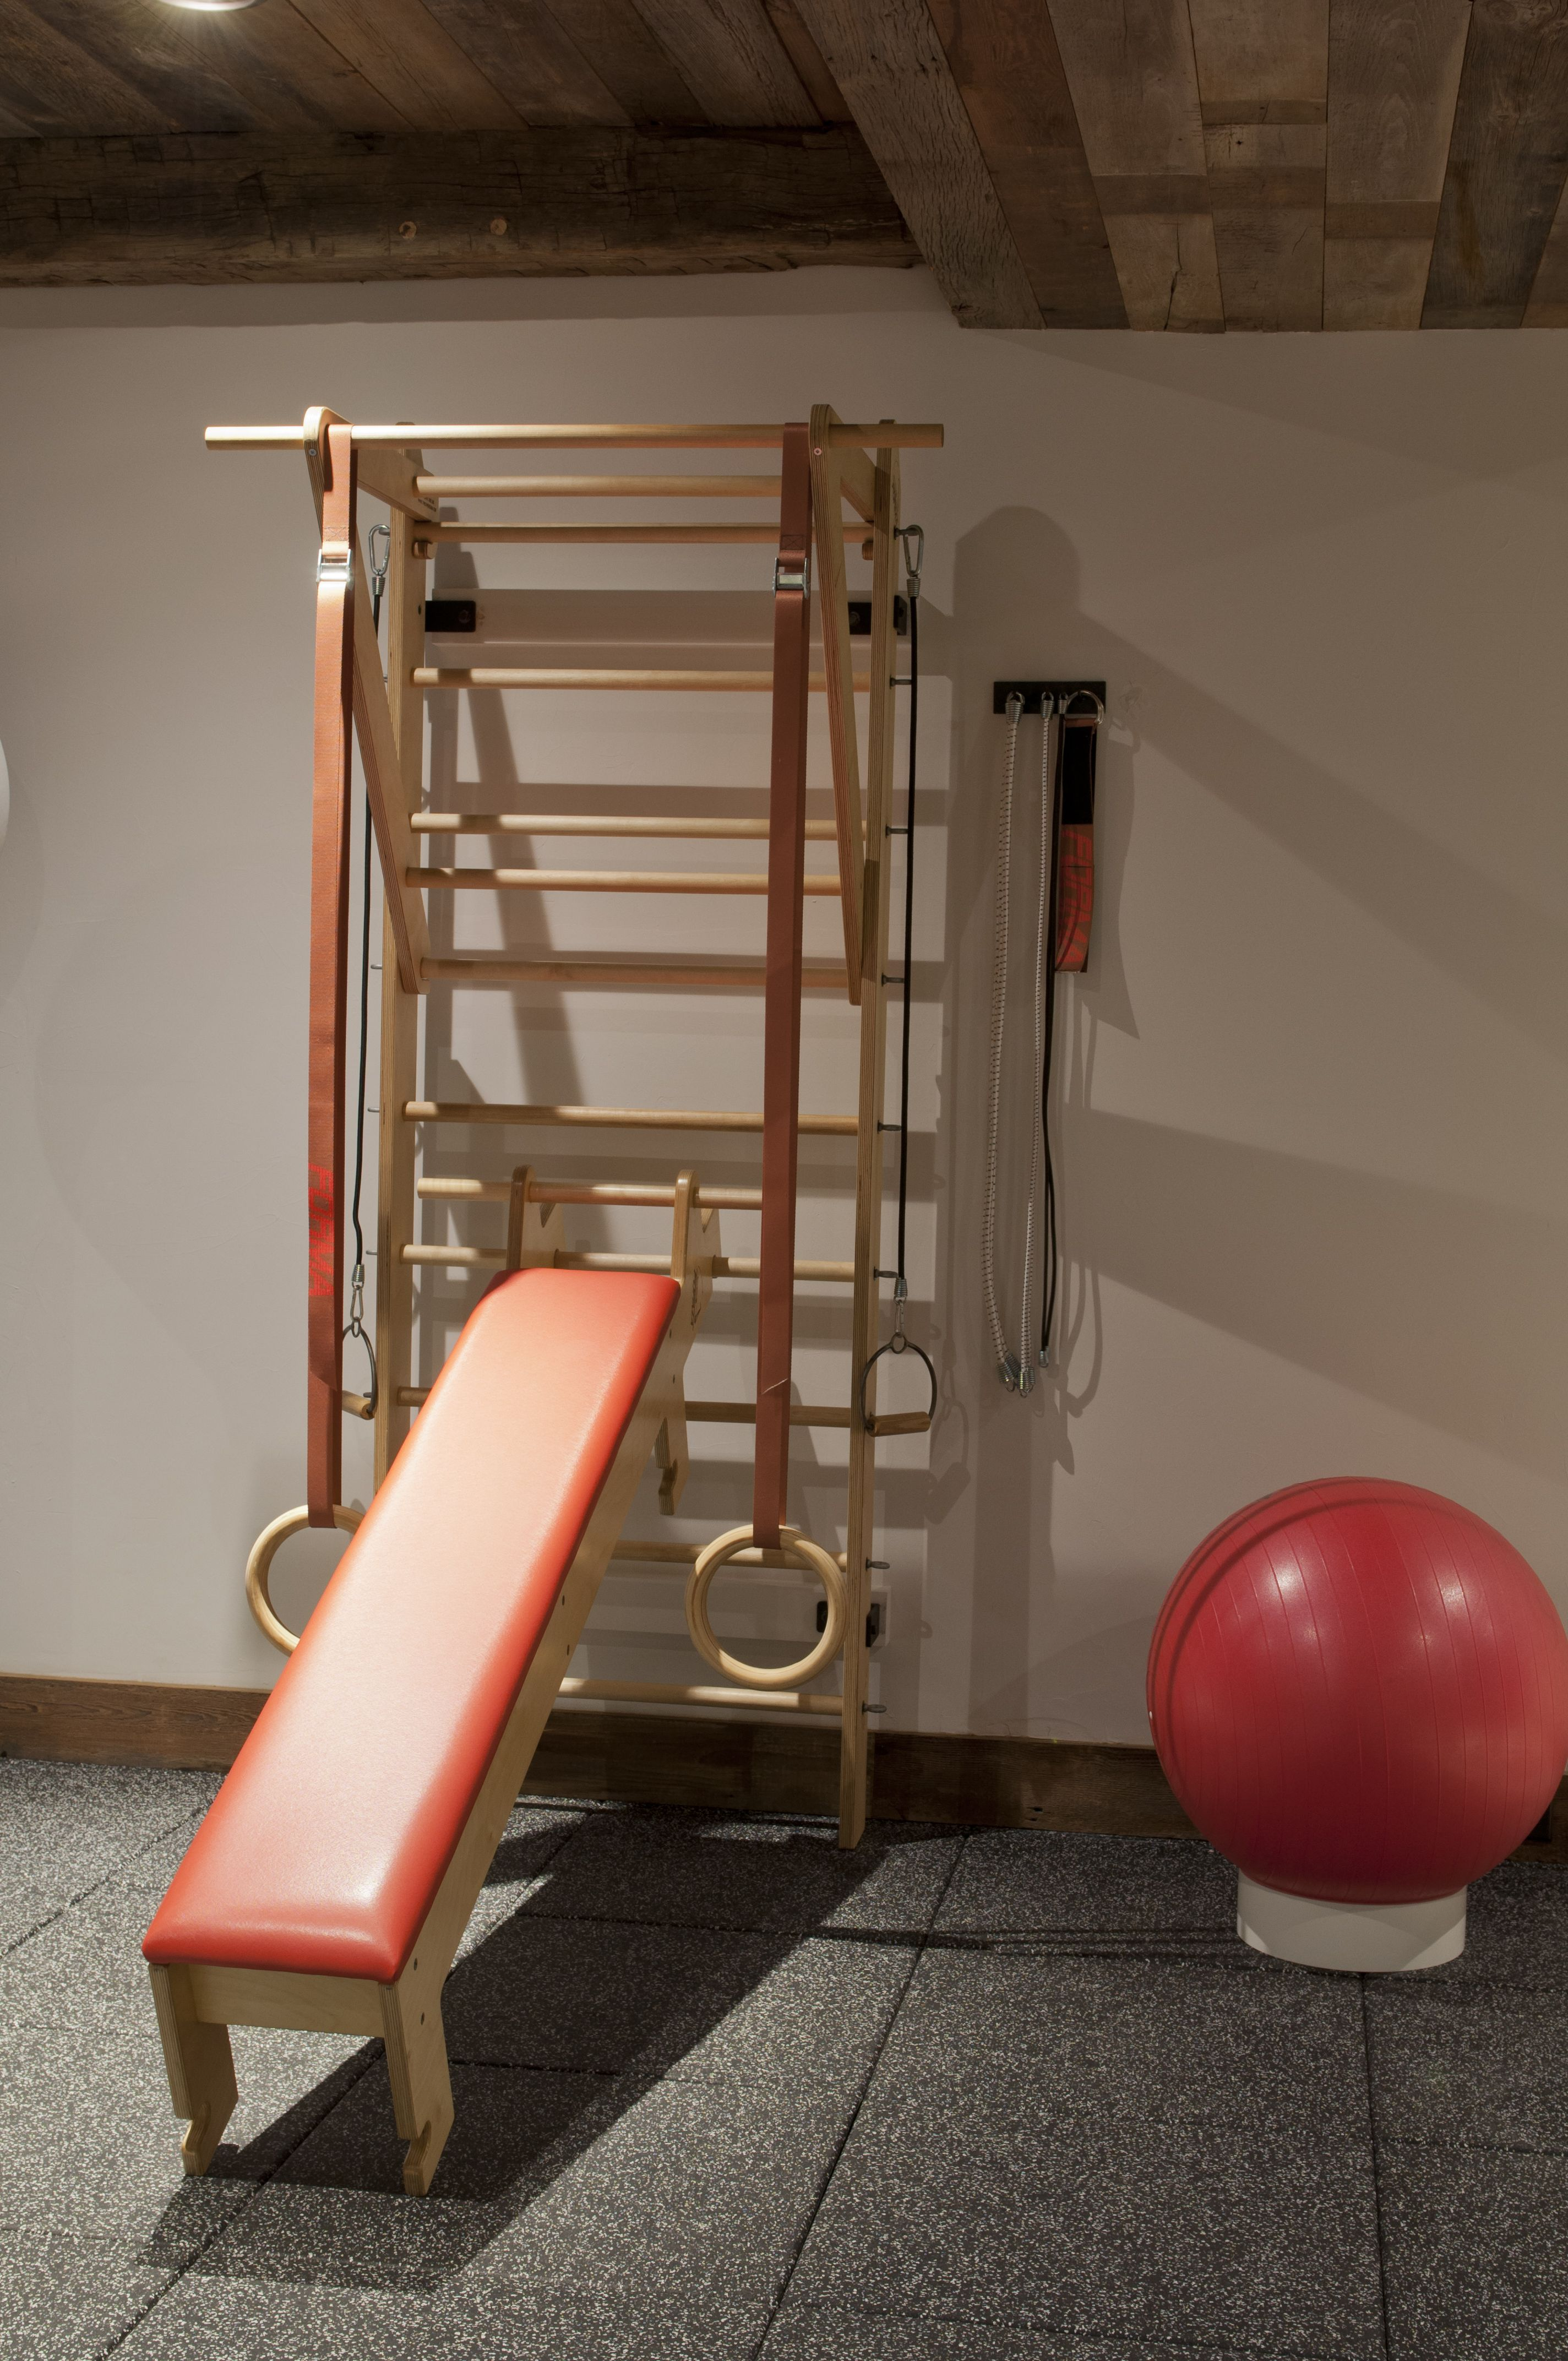 Stall bars swedish ladder forma totus christof prus